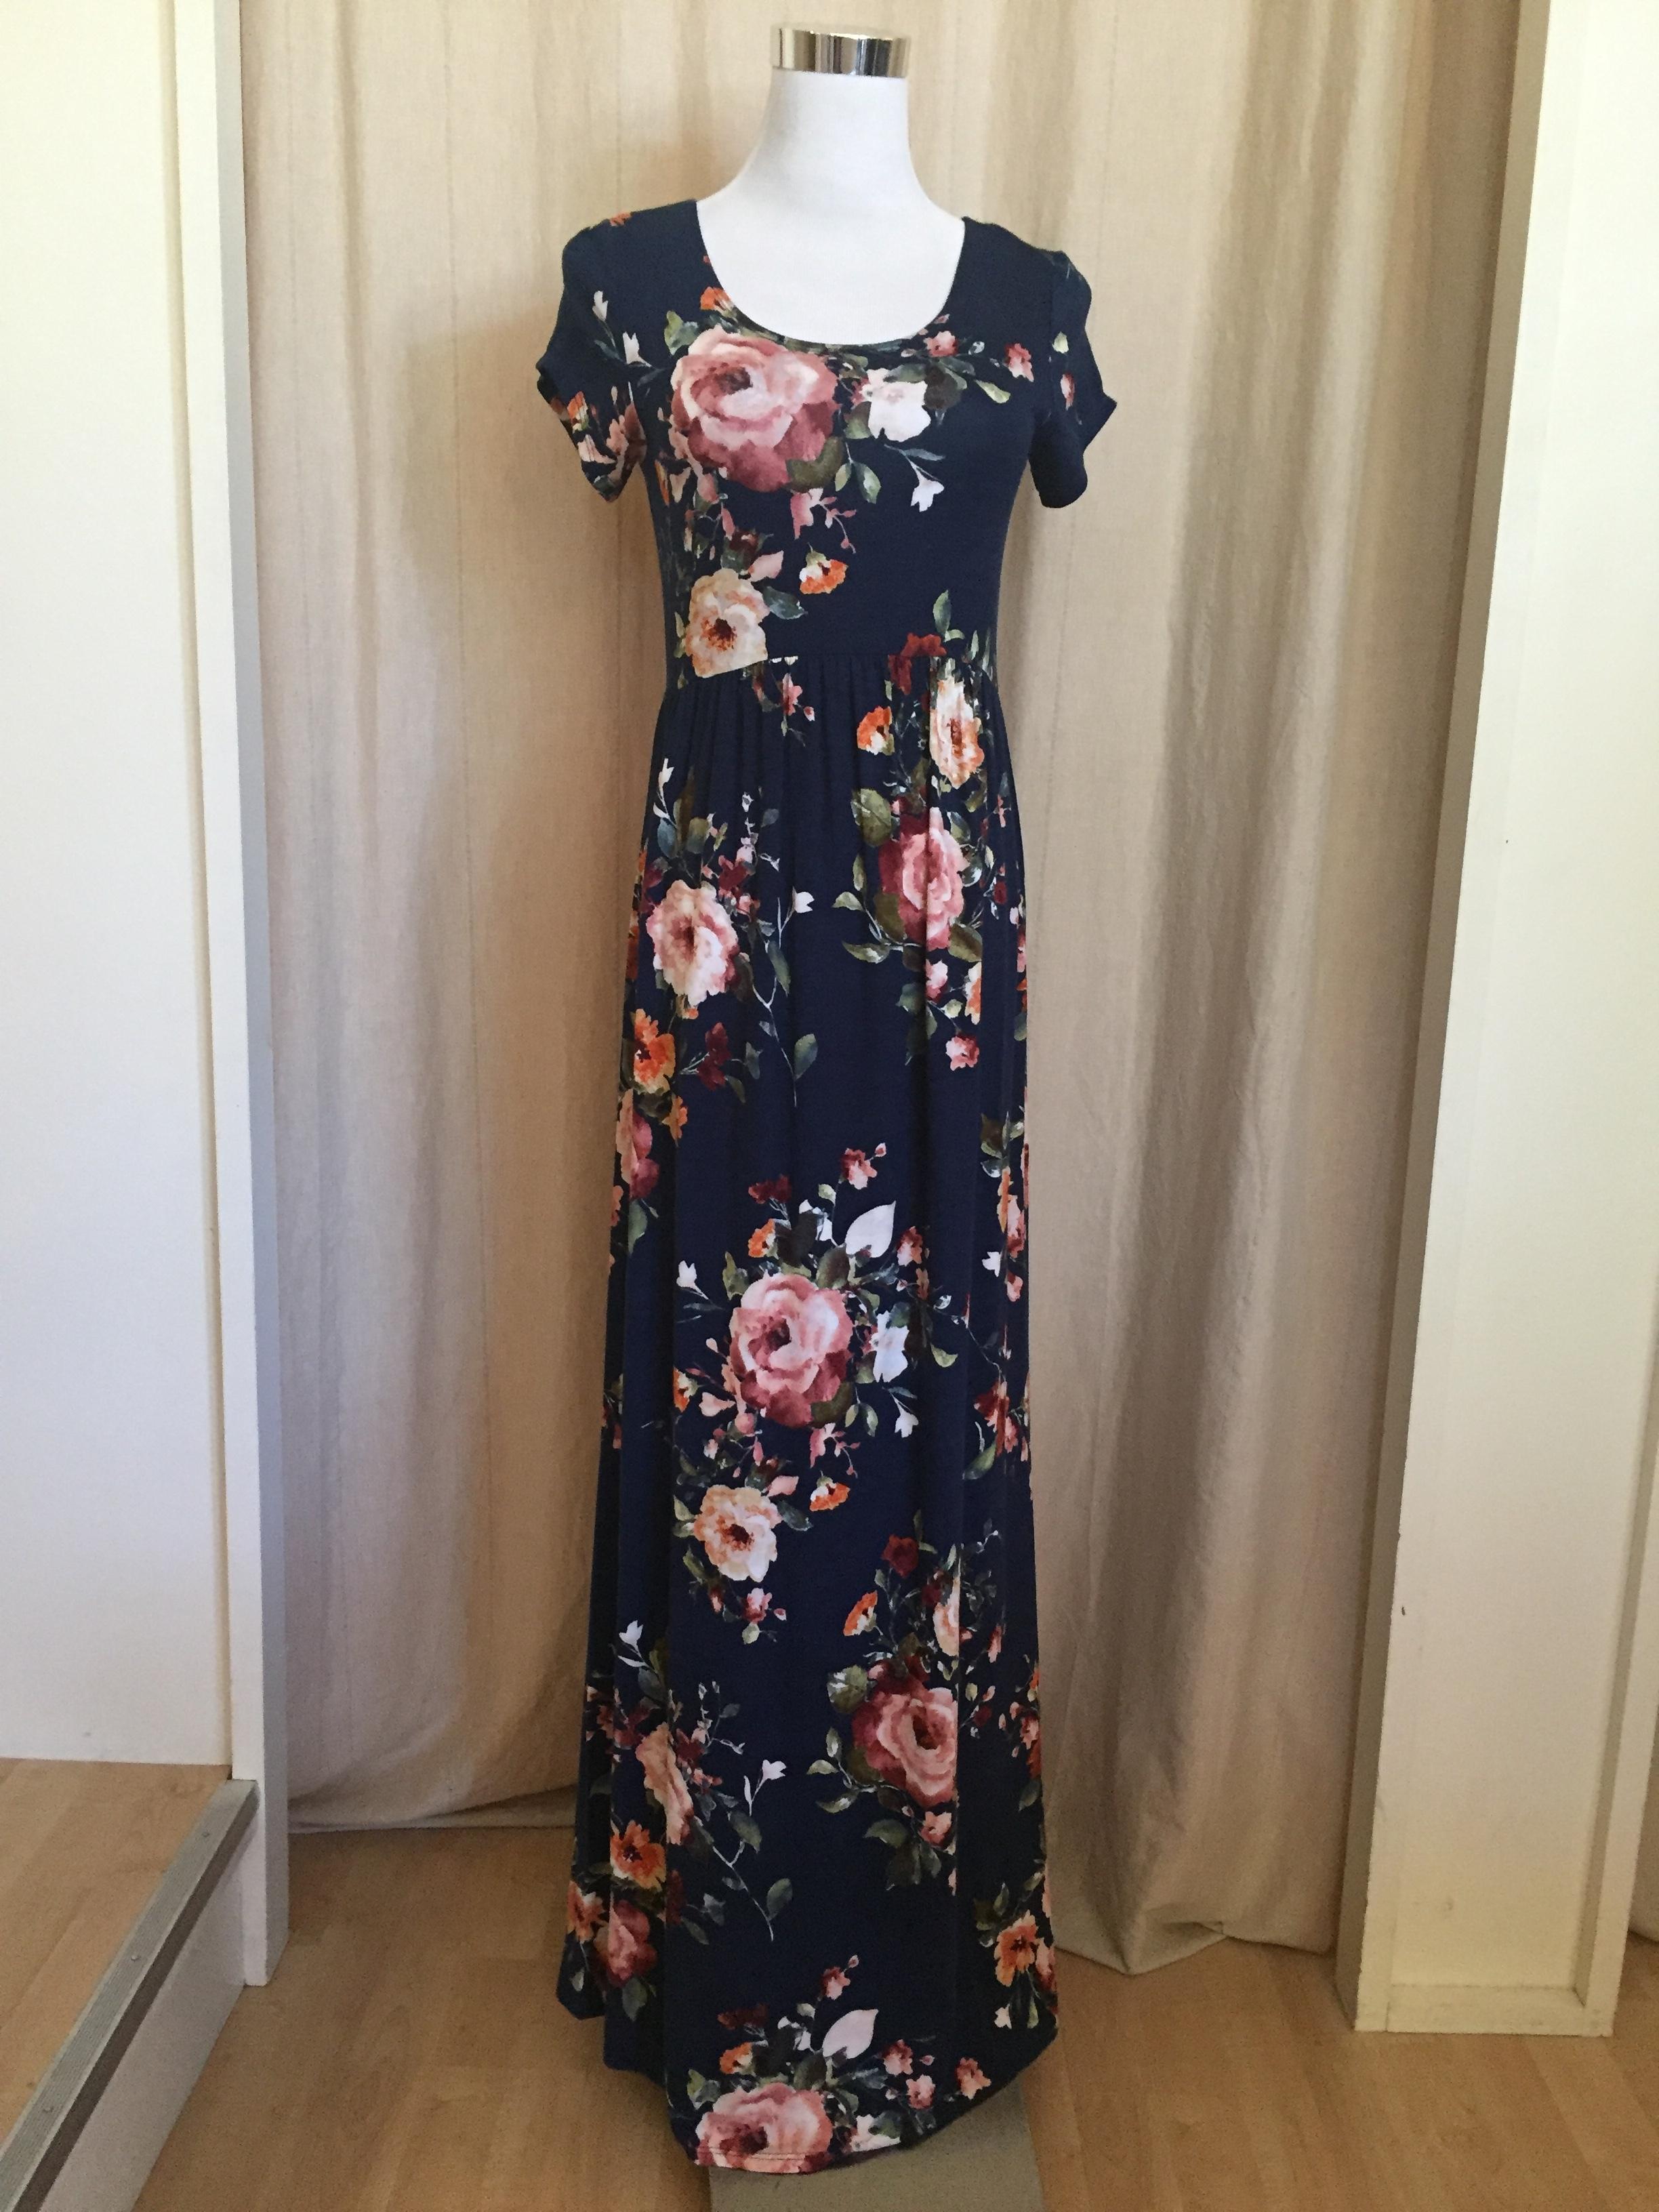 Stunning Floral Maxi, $35